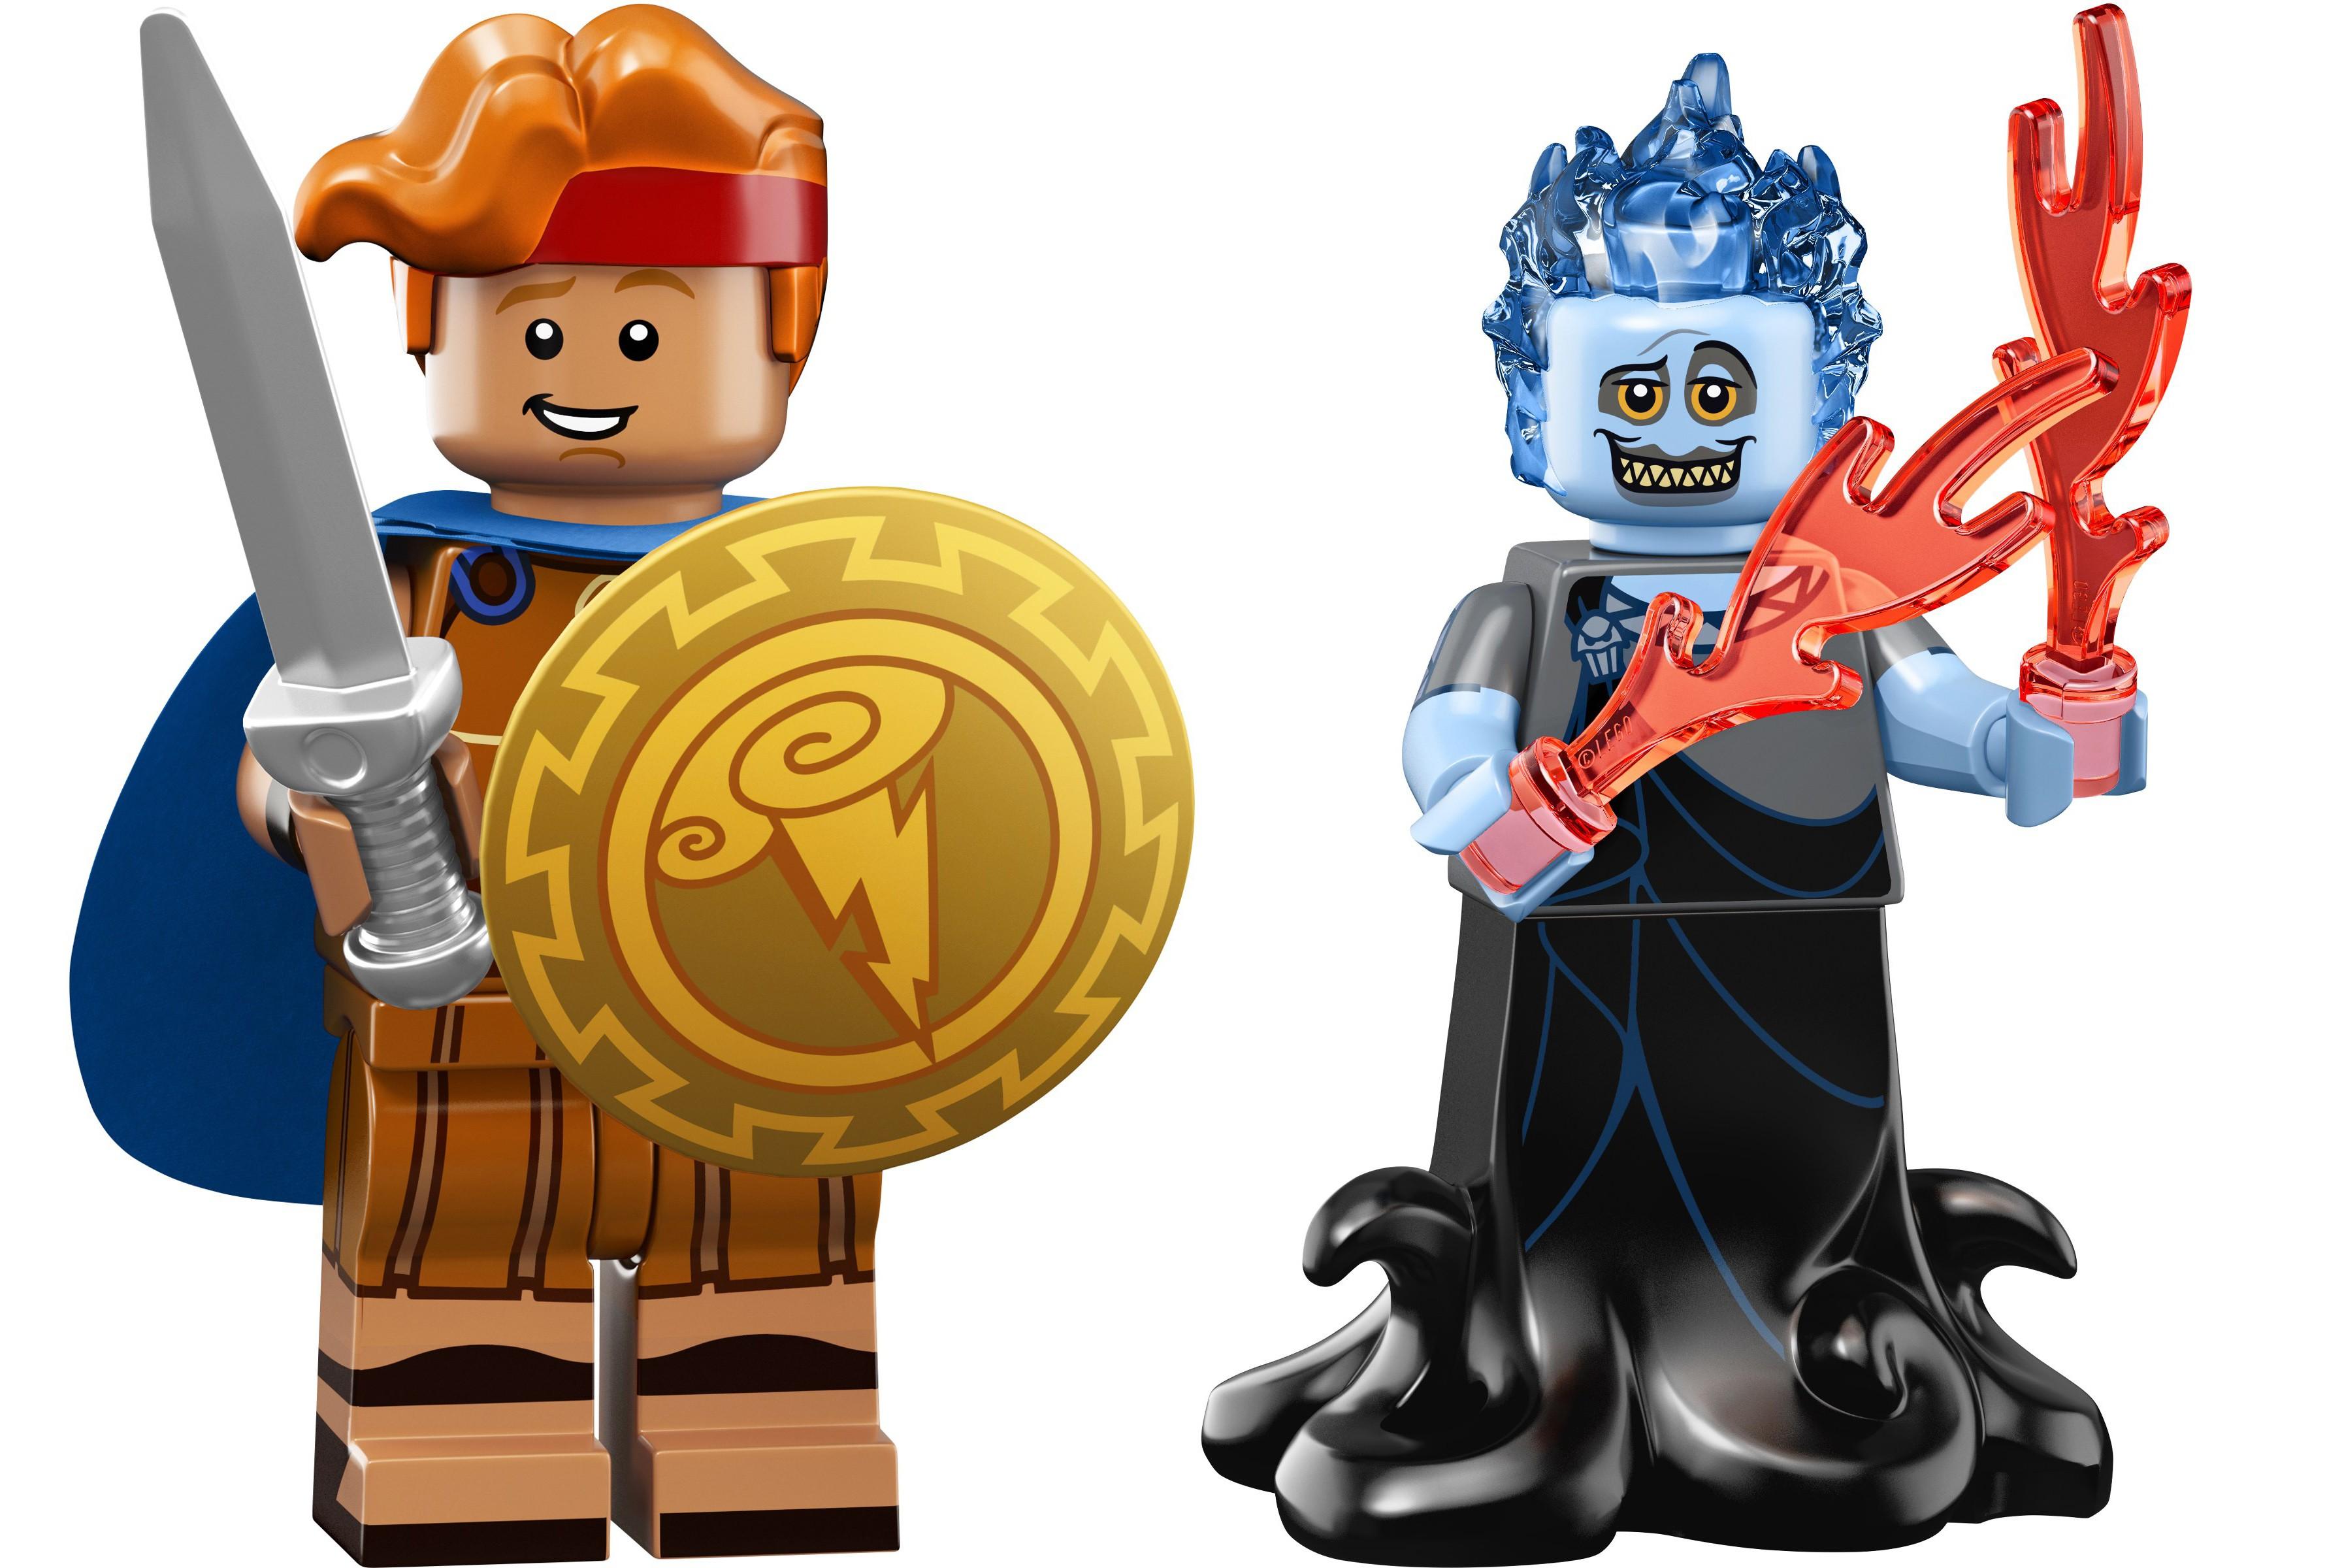 Hades Lego 71024 Disney Series 2 Minifigure